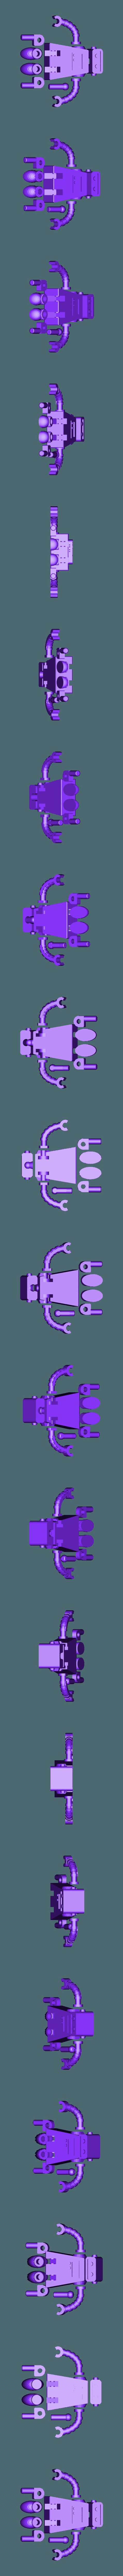 mama.stl Download free STL file Robot Family Simple No Support • 3D printable design, Toymakr3D